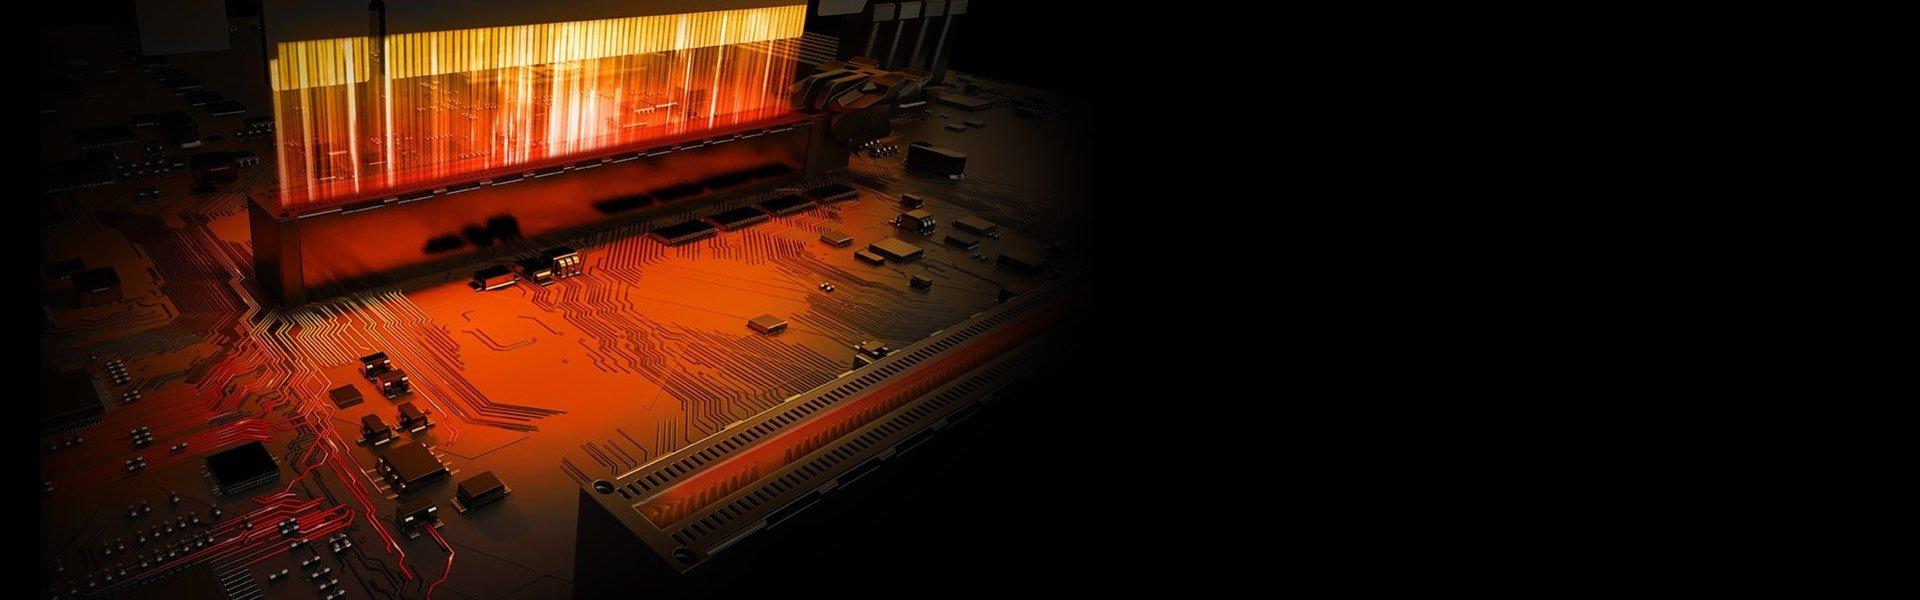 VGA PCIE4.0